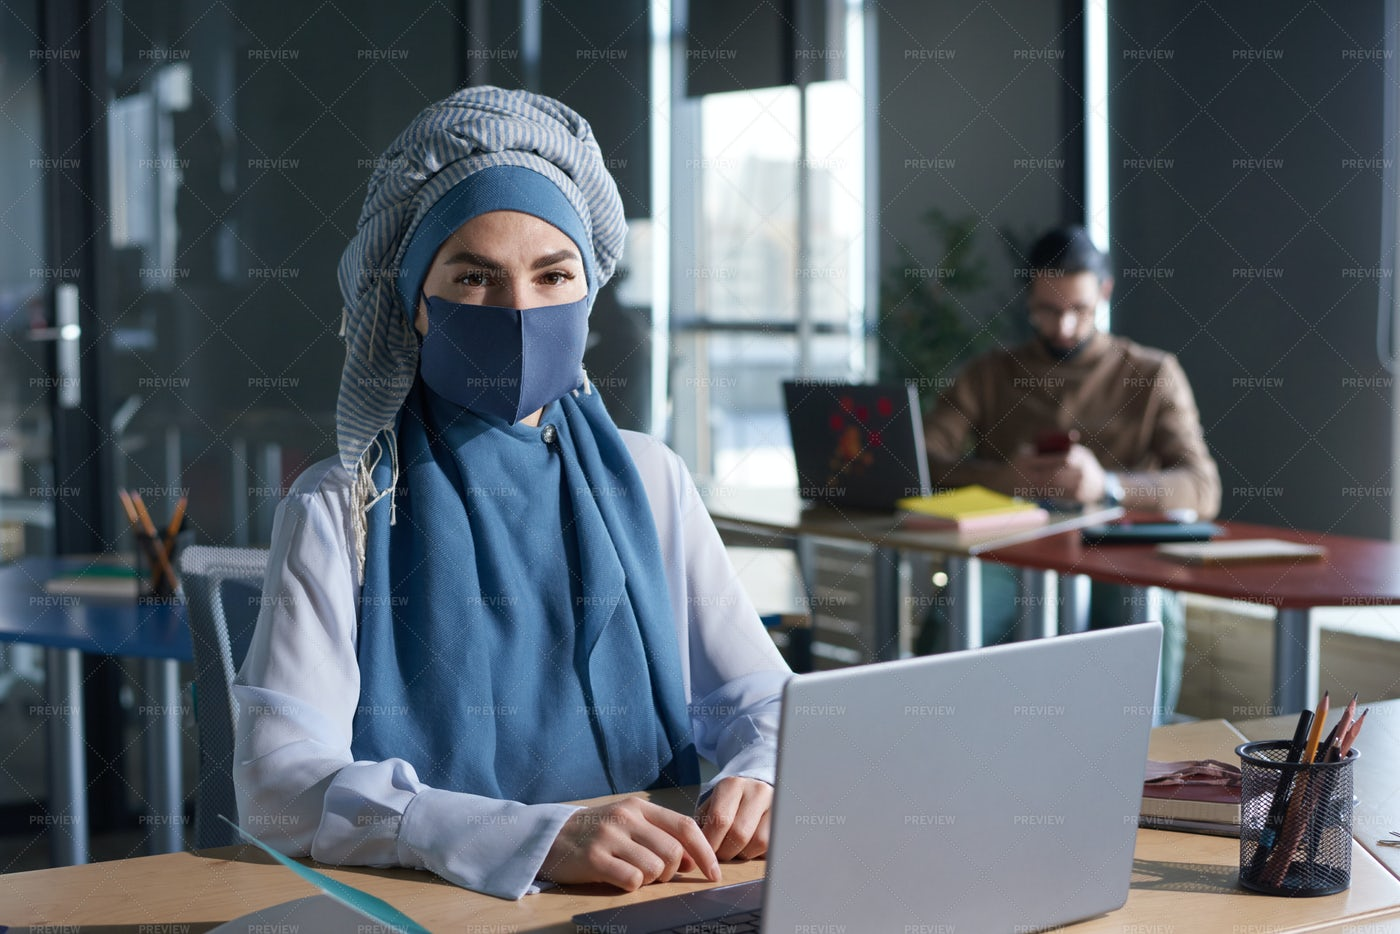 Woman Working During Pandemic: Stock Photos